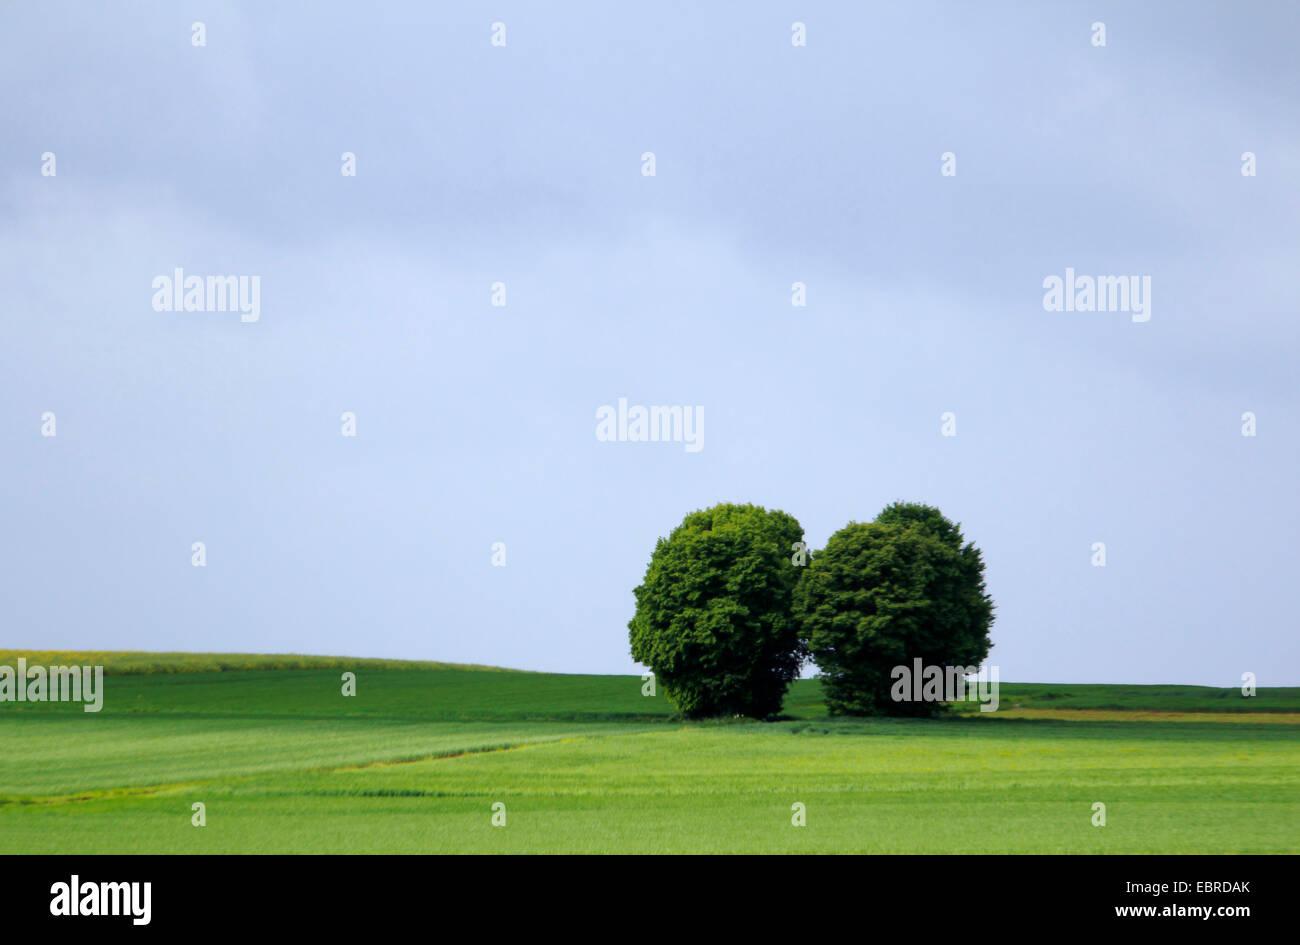 grünen Kornfeld mit Bäumen, Deutschland, Rheinland-Pfalz, Eifel Stockbild